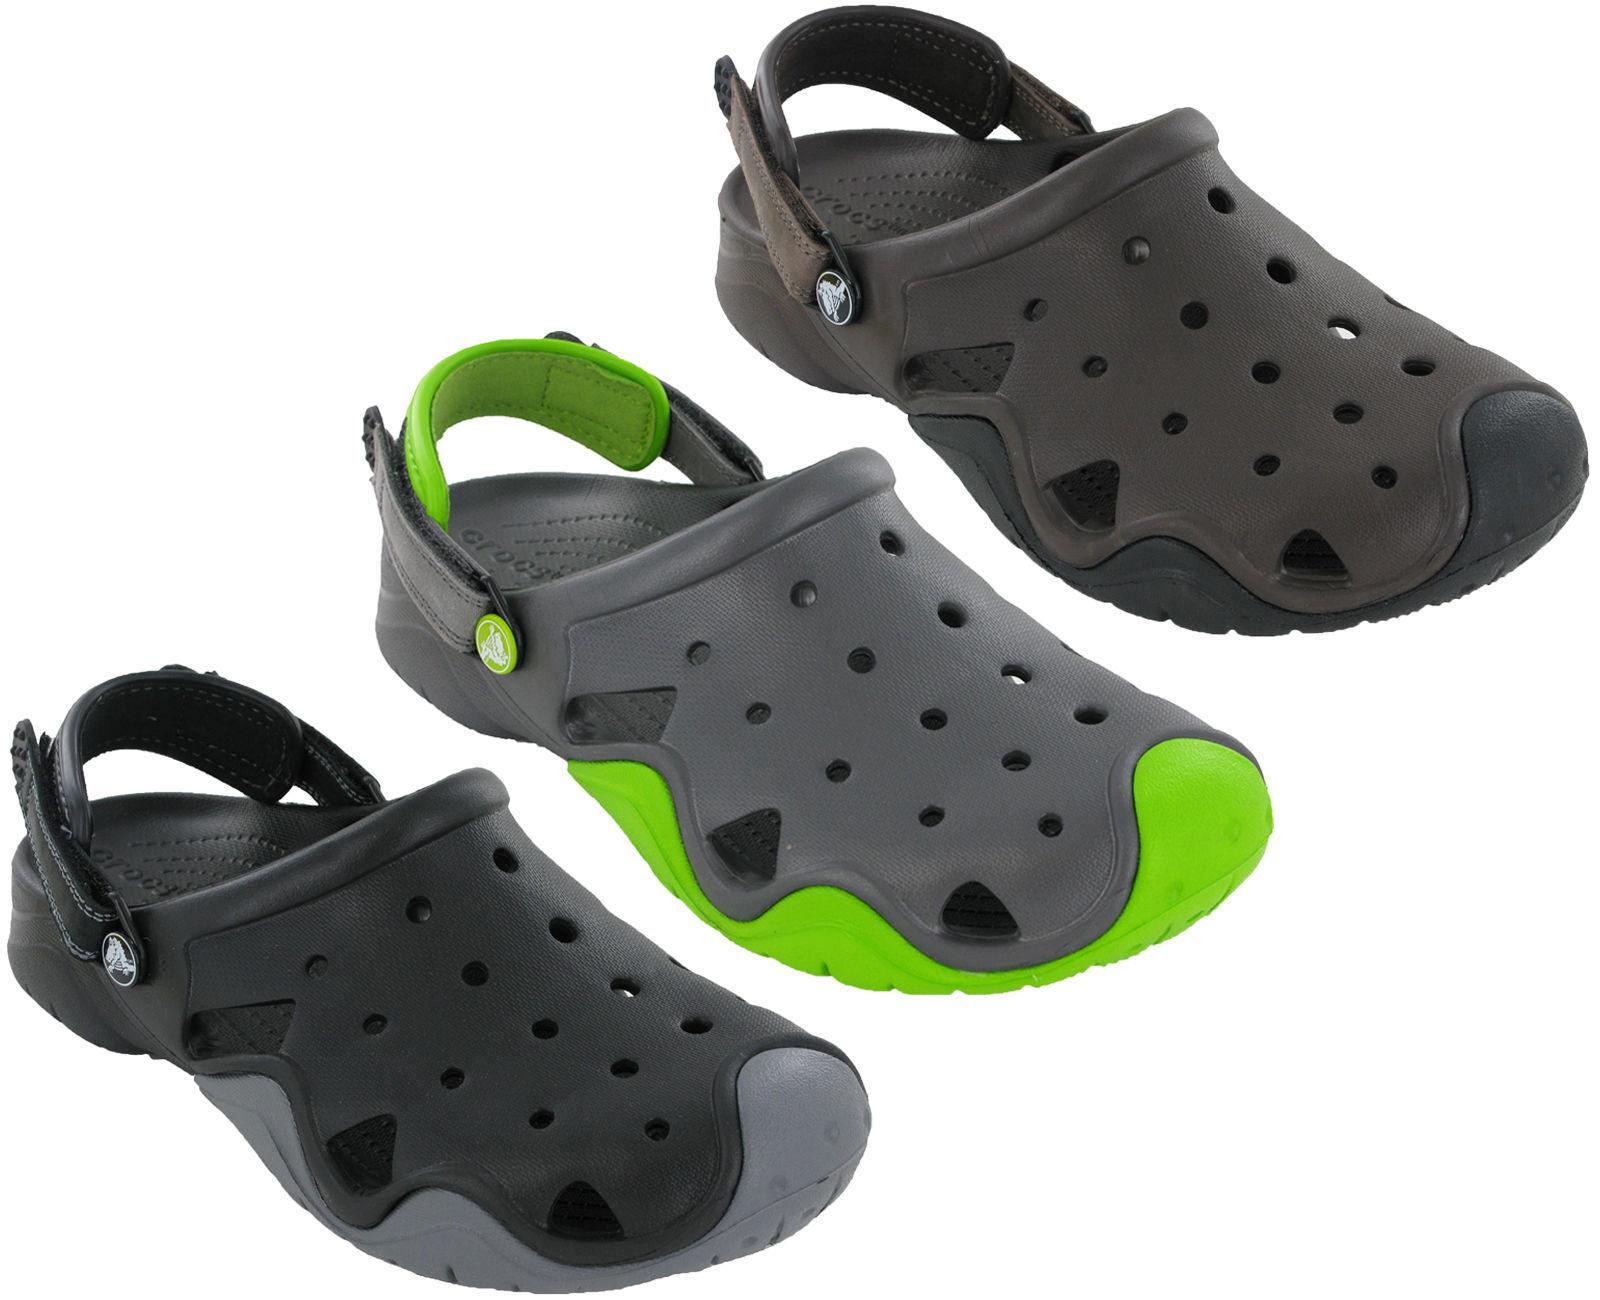 Crocs Swiftwater Clog Sandals  Adjustable Flat Strap Fastening Slip On Beach